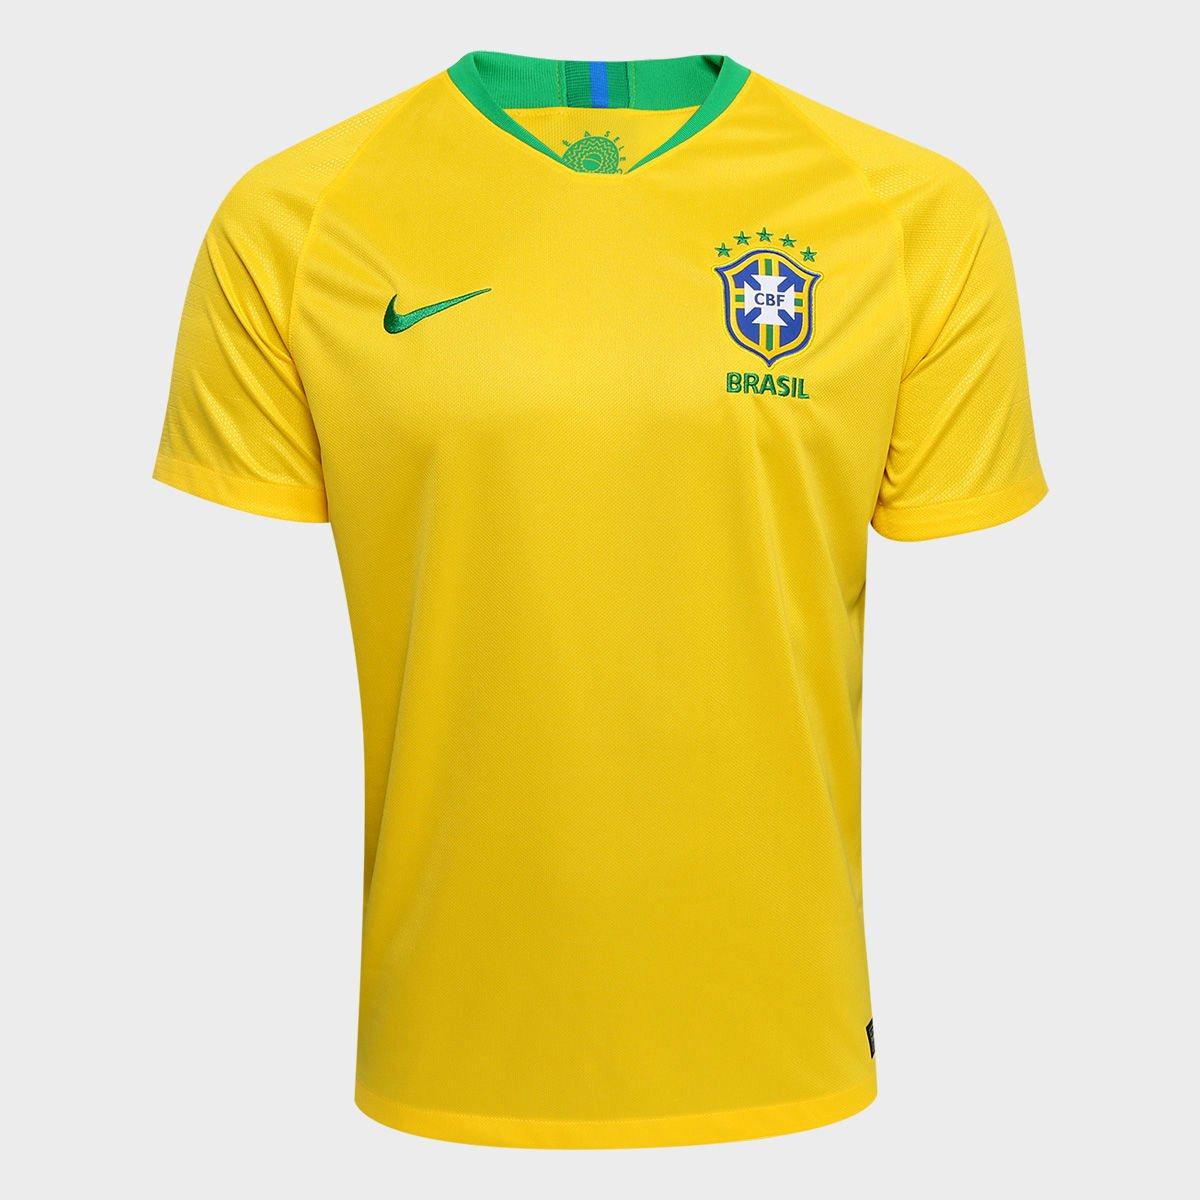 Camisa Seleção Brasil I 2018 s n° - Torcedor Nike Masculina - Amarelo e  Verde. R  249 f2ee87cfc6be6